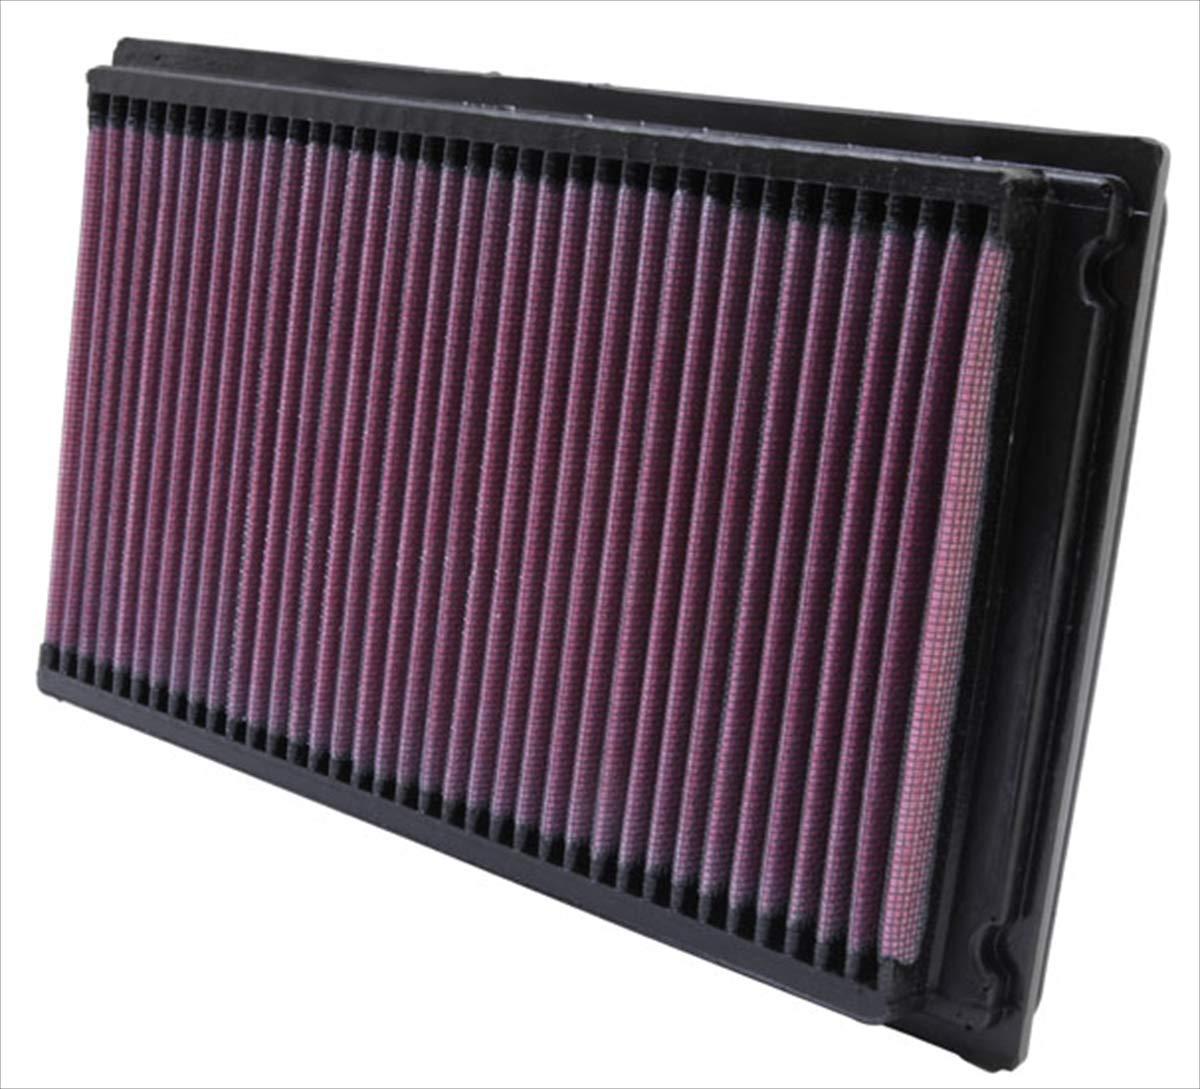 K&N 33-2031-2 High-Performance Air Filter